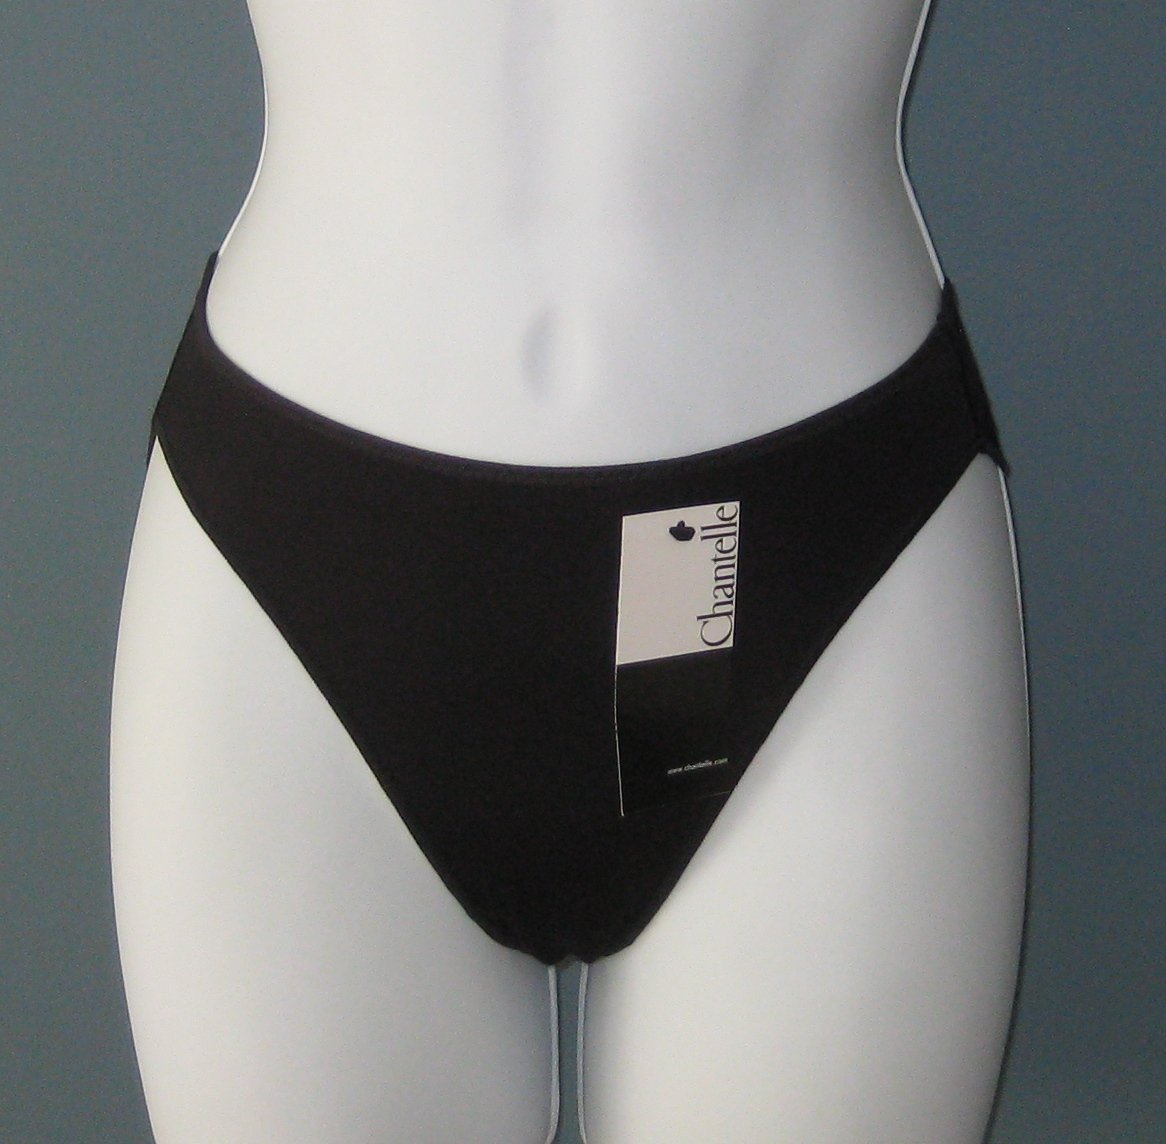 NWT Chantelle Black Invisible Slip Panty Brazilian Brief #3073 - XS